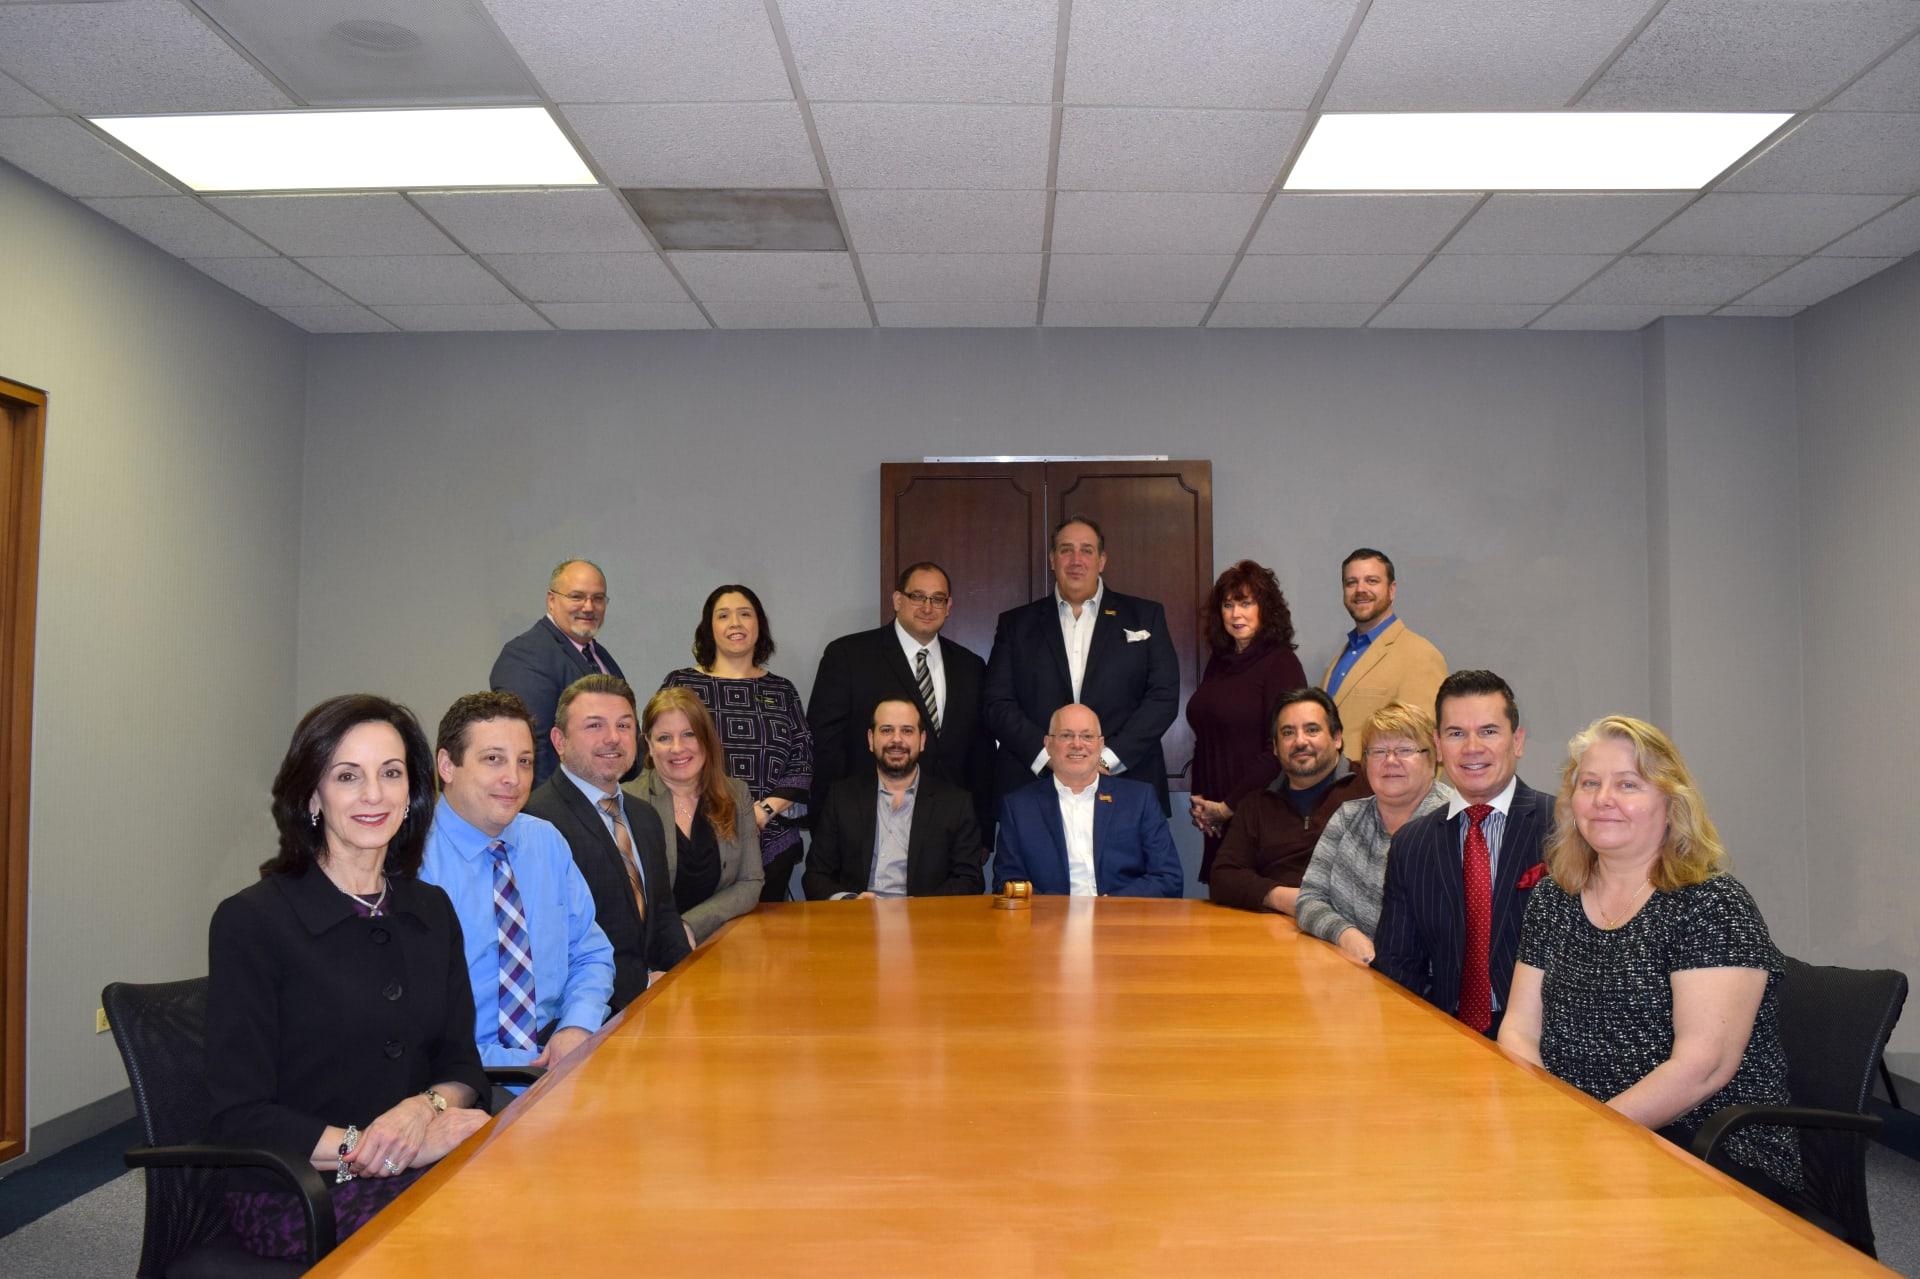 Board-of-Directors-Photos-w1920.jpg